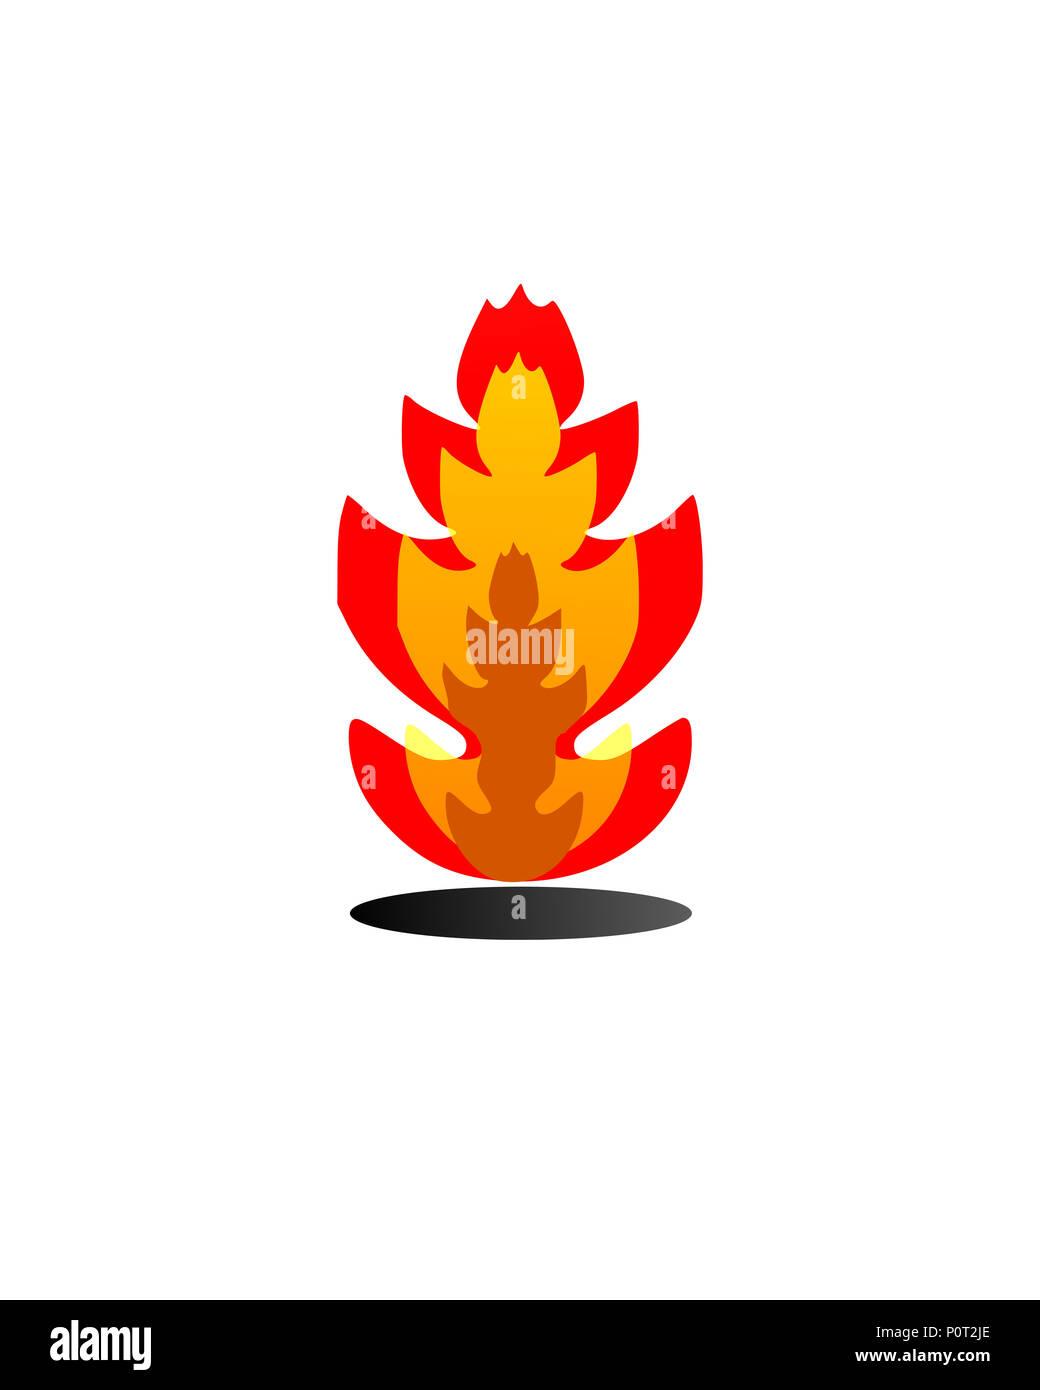 Fire burning Sticker or tattoo (illustrations ) - Stock Image